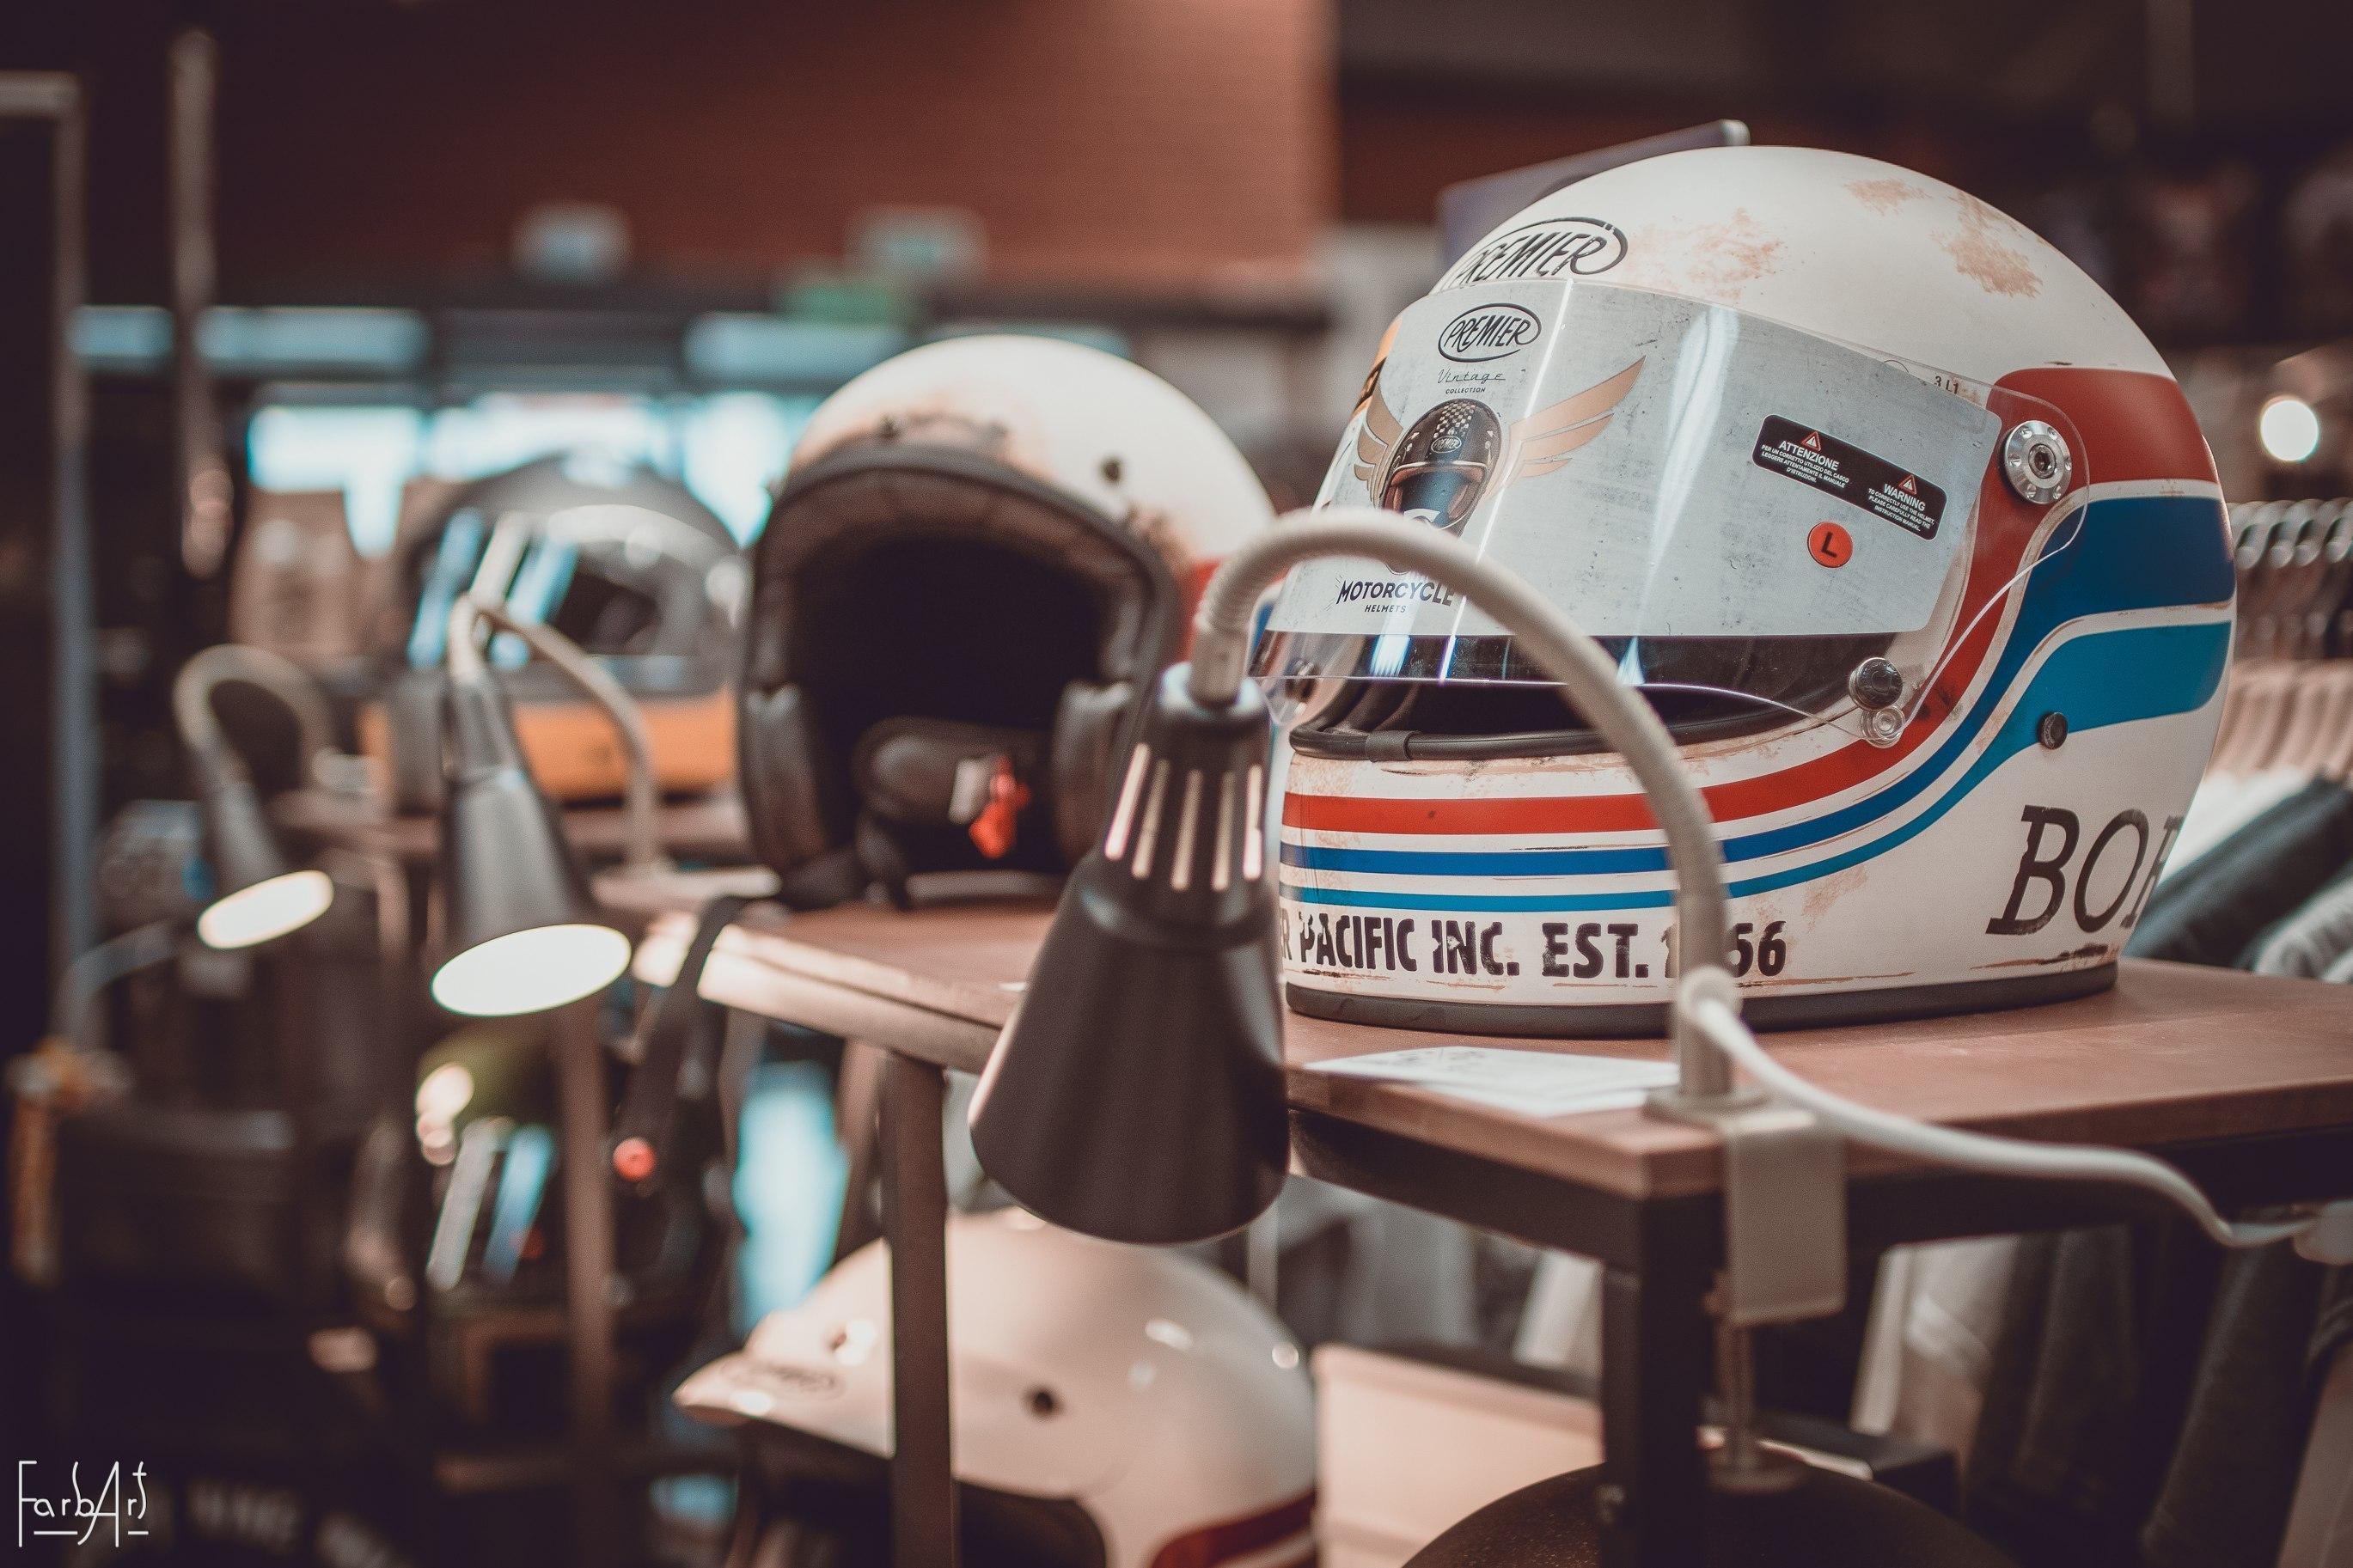 Premier Helmets BTR